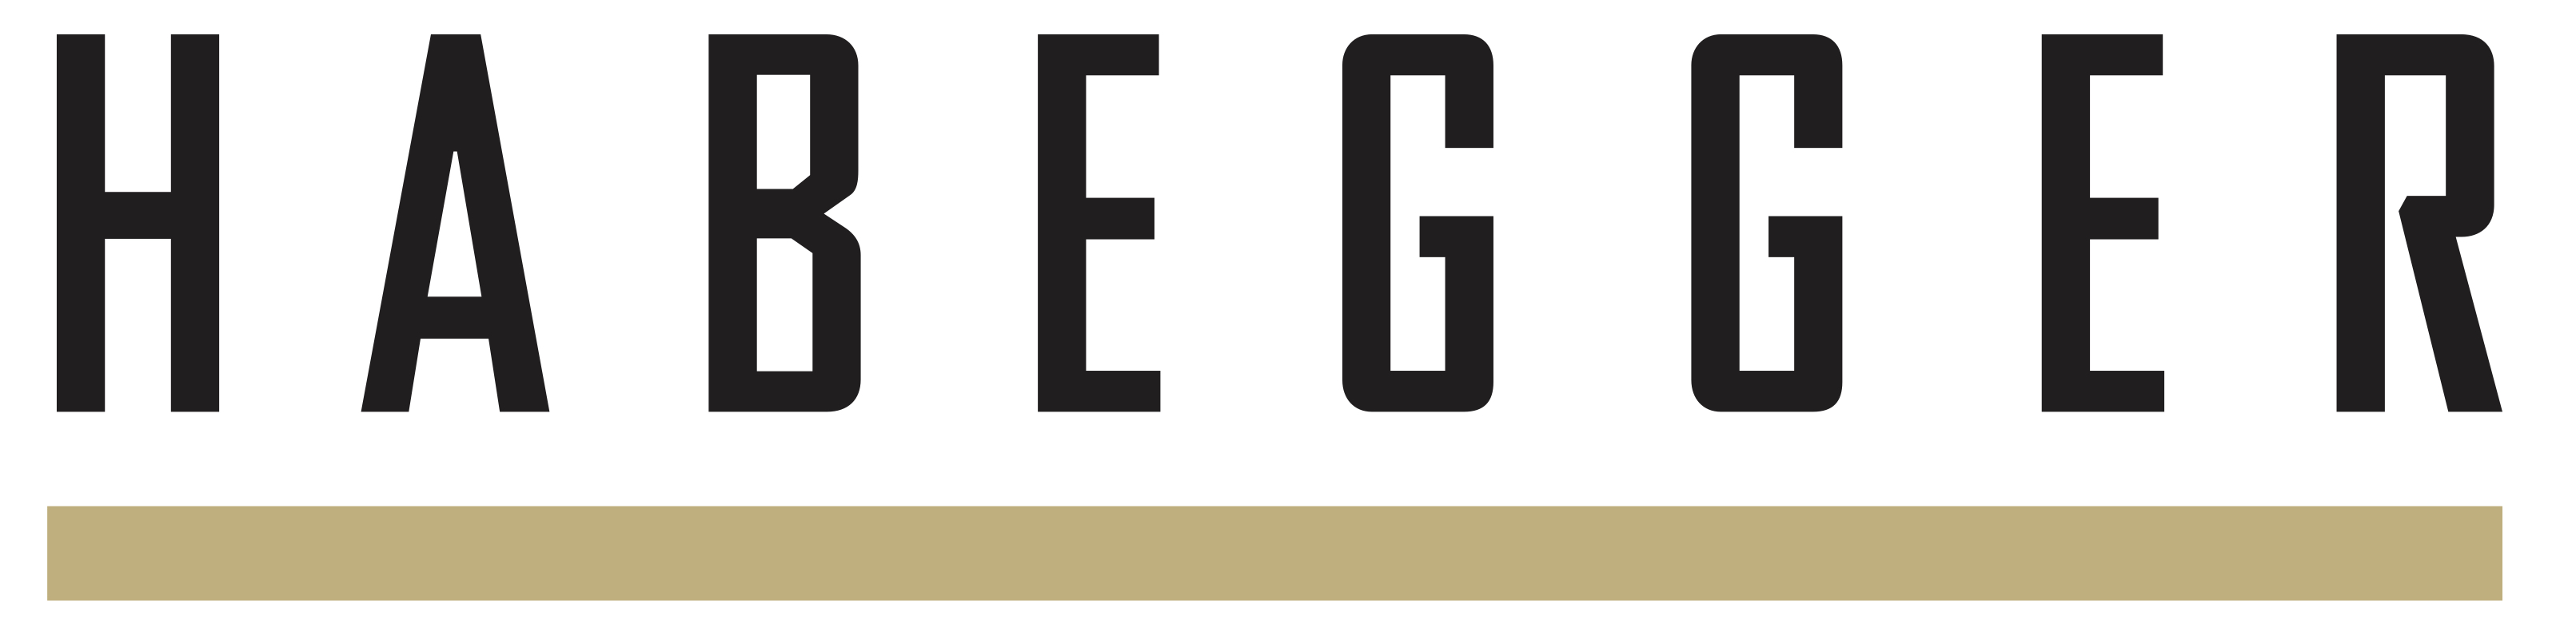 Habegger GmbH